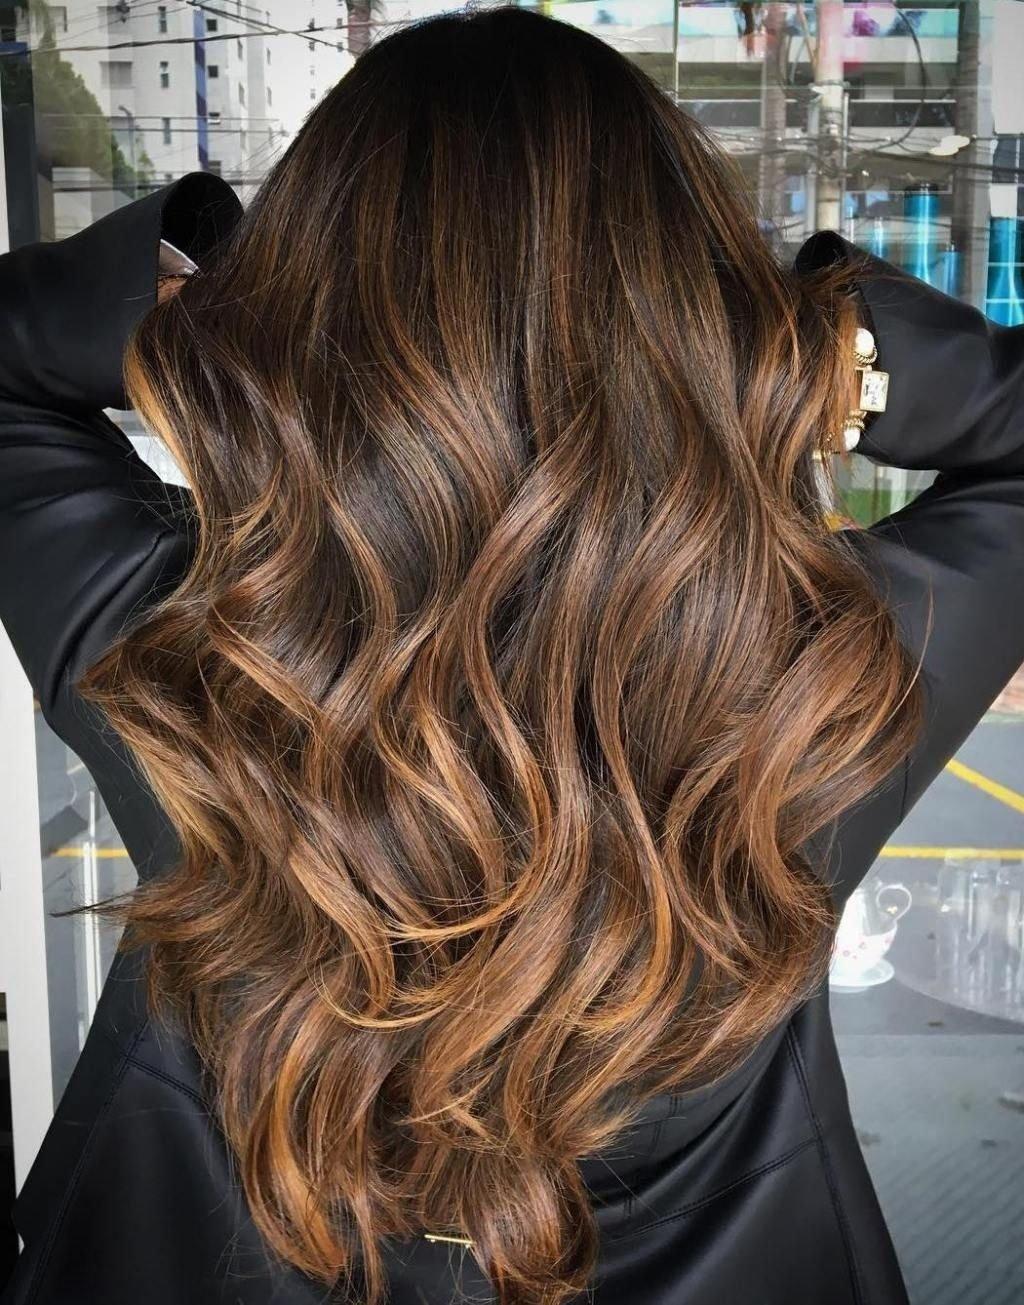 10 Stylish Hair Color Ideas Long Hair 70 flattering balayage hair color ideas for 2018 coiffures 2020